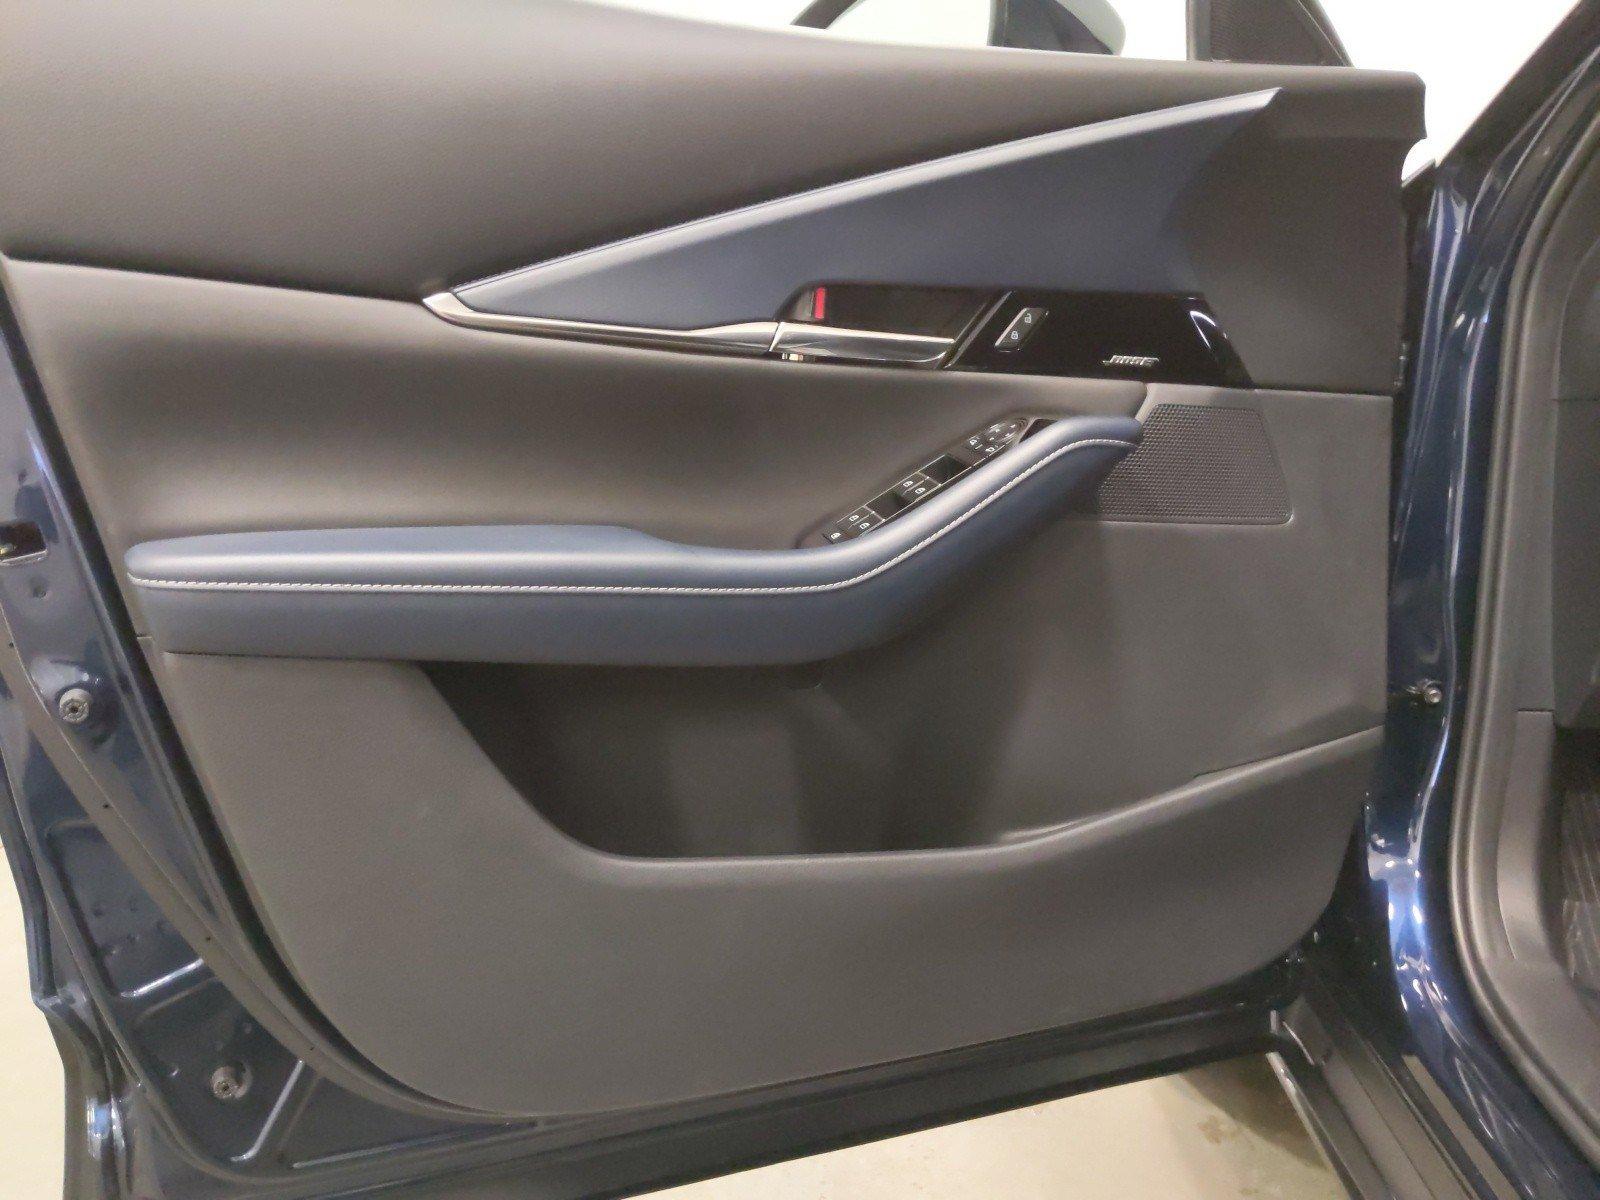 New 2020 Mazda Cx-30 Preferred Package Sport Utility for sale in Lincoln NE